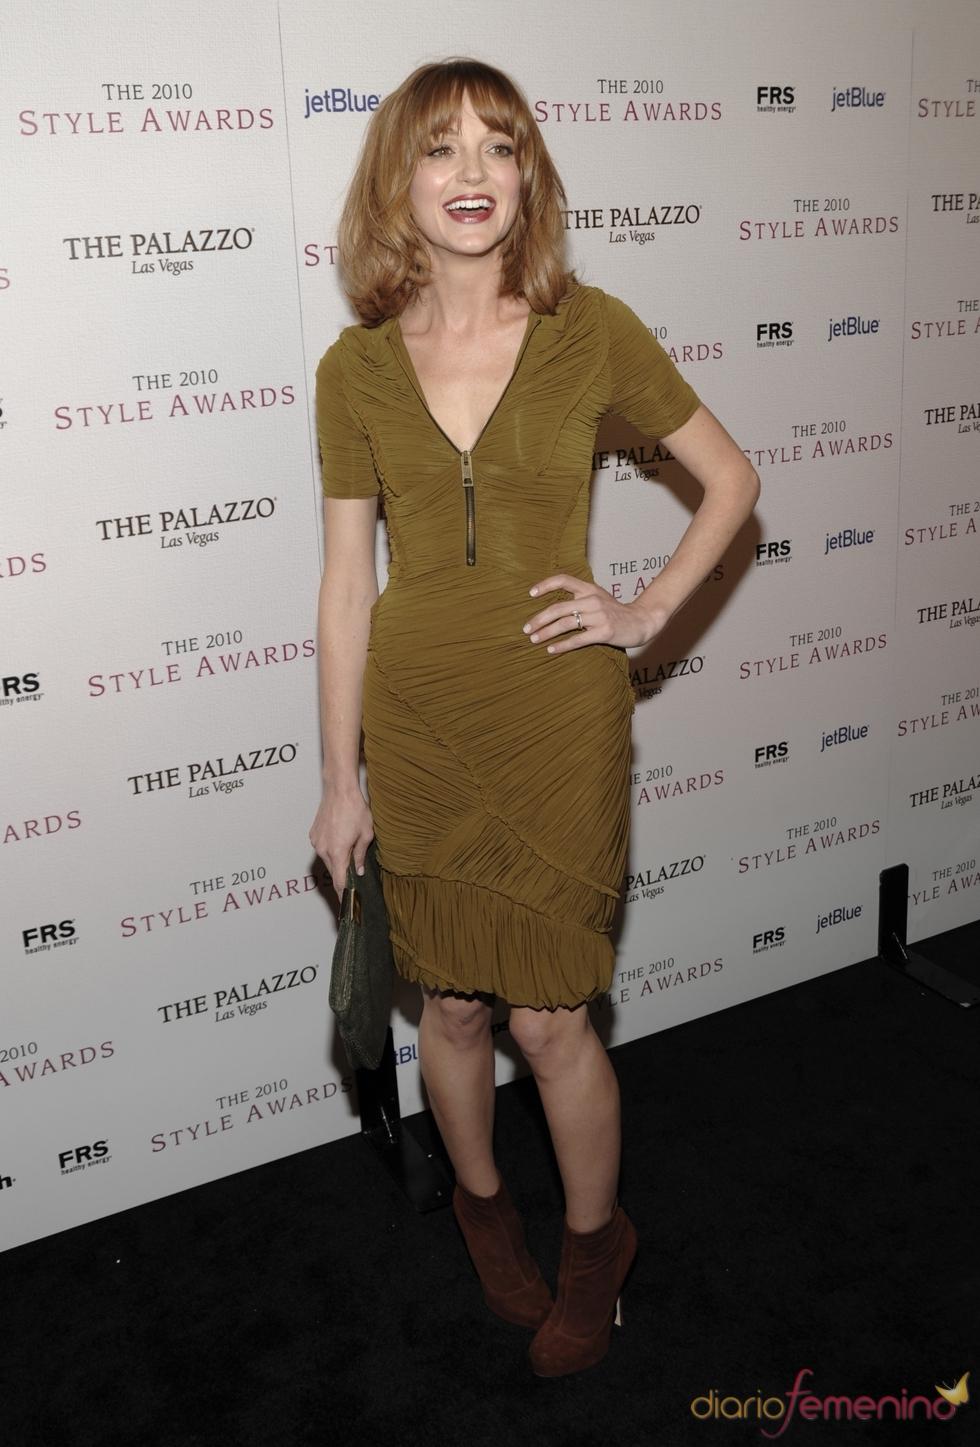 Jayma Mays en los Premios Hollywood Style 2010